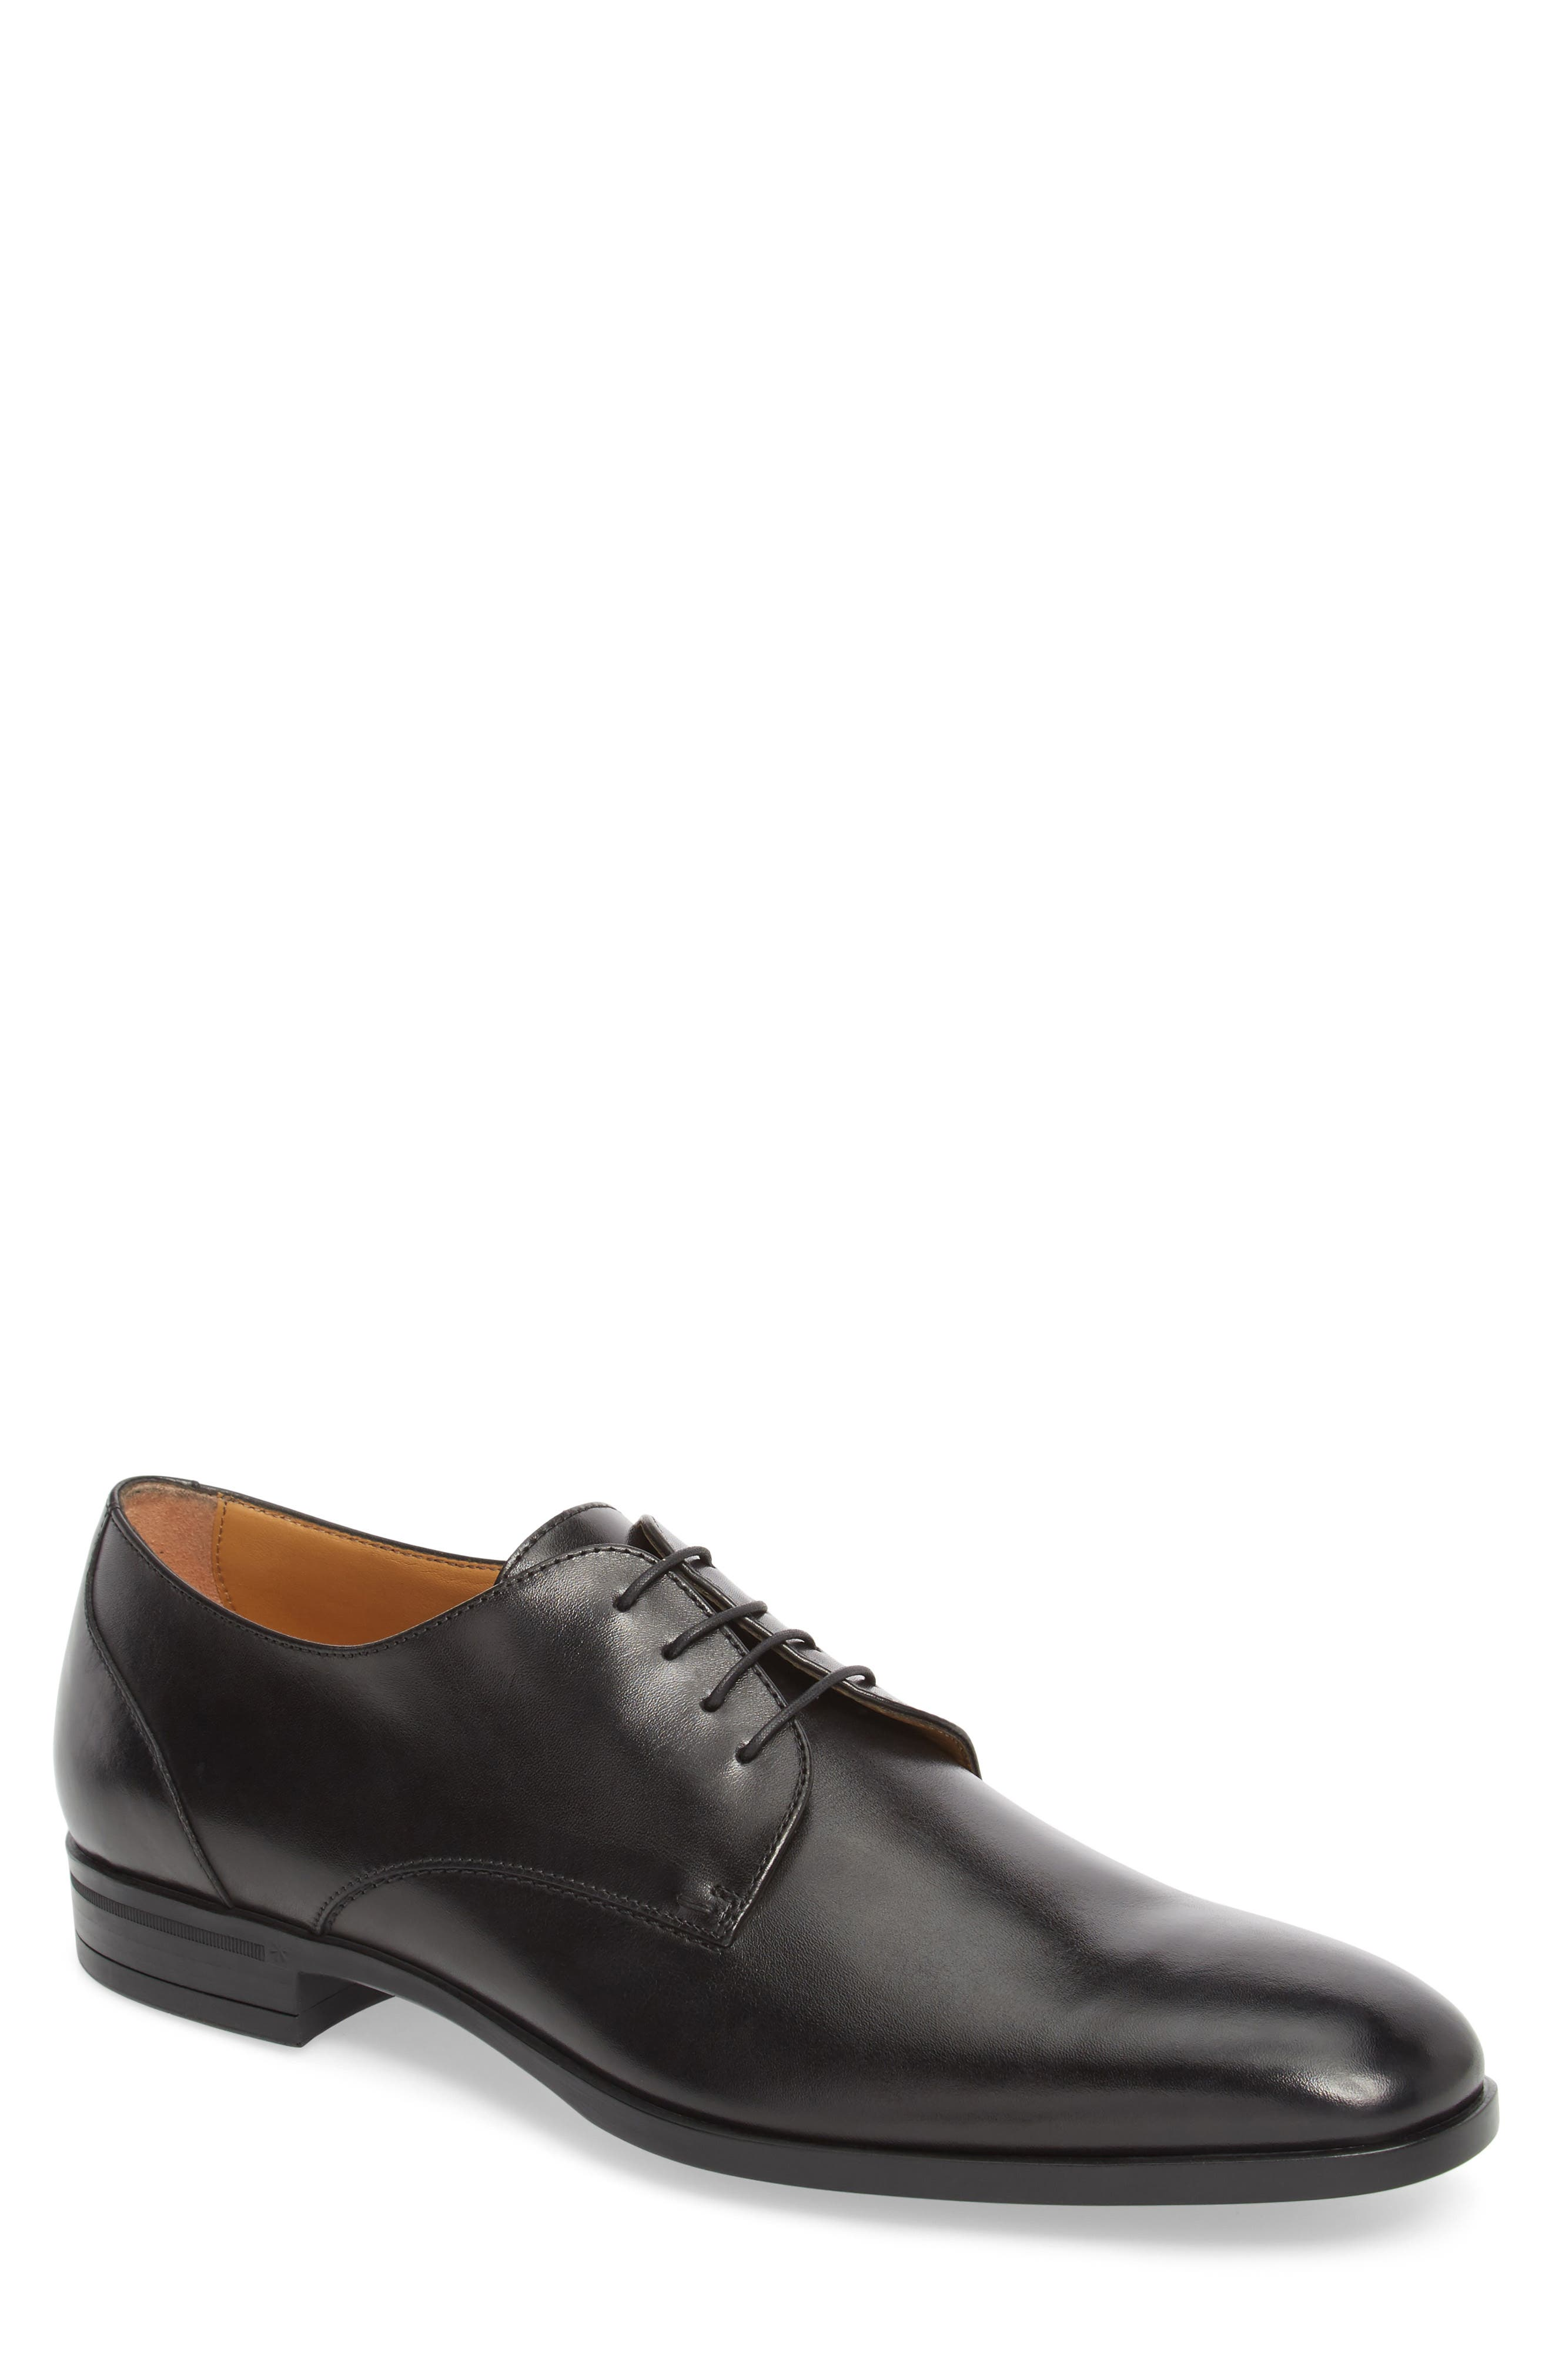 Portland Plain Toe Derby,                         Main,                         color, Black Leather